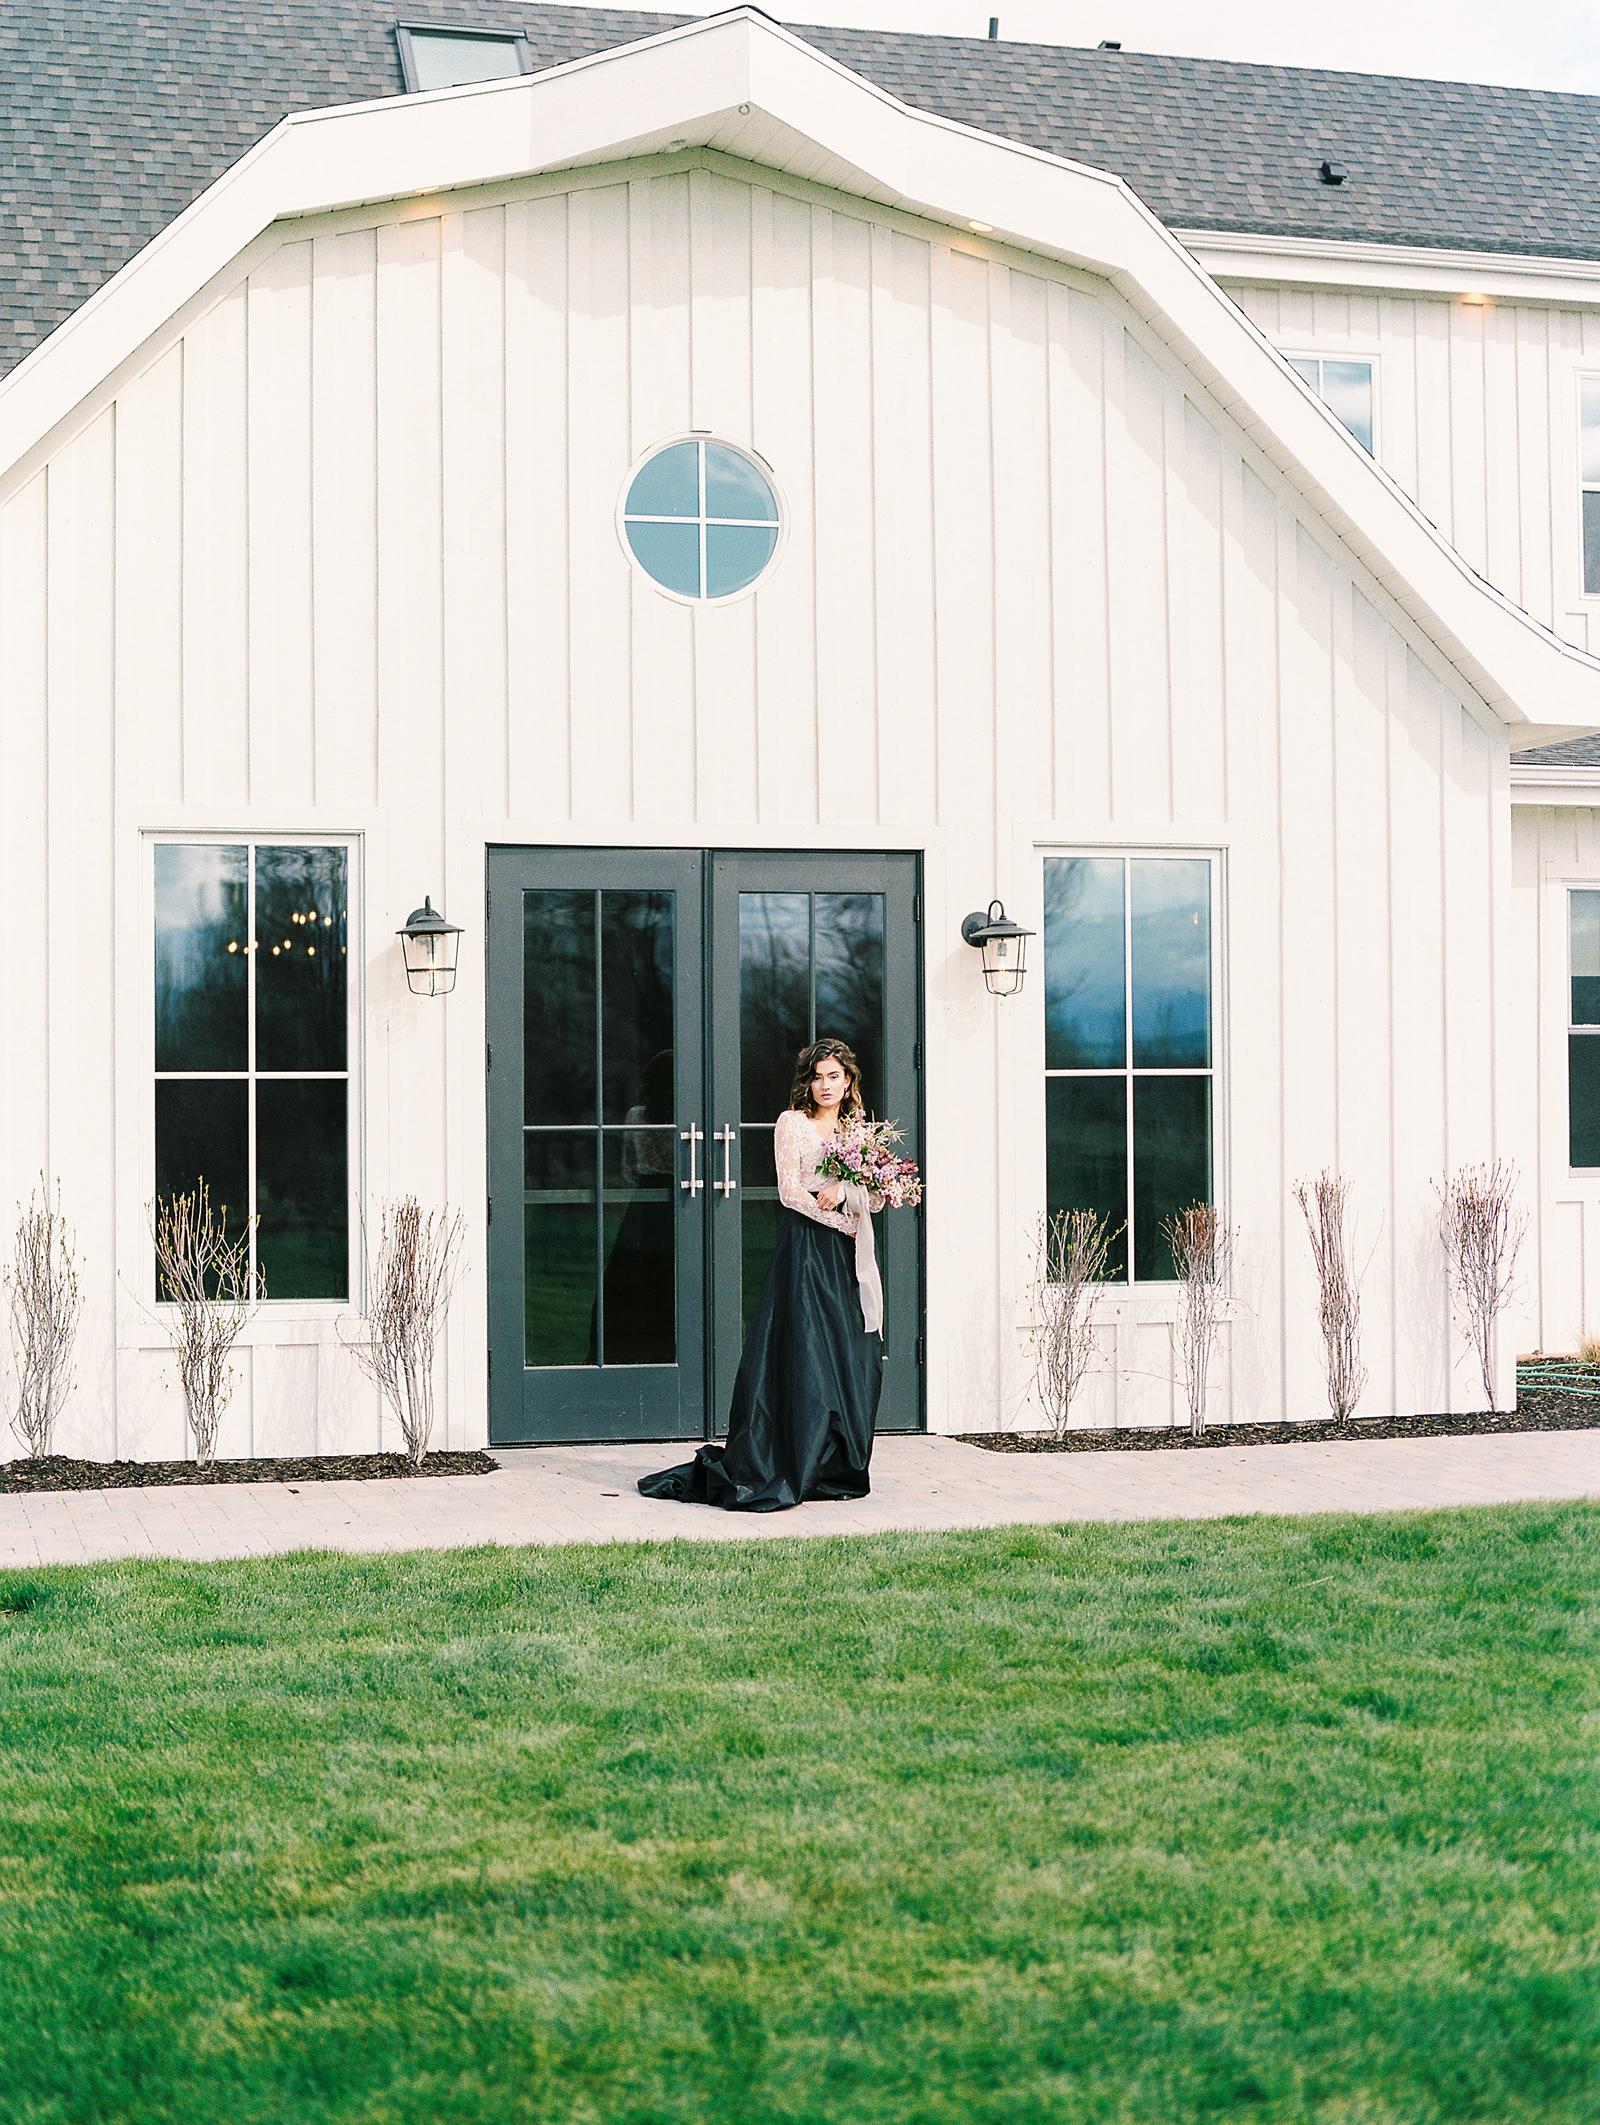 Heber Valley Natural Organic Wedding Inspiration at River Bottoms Ranch, Utah wedding venue film photography